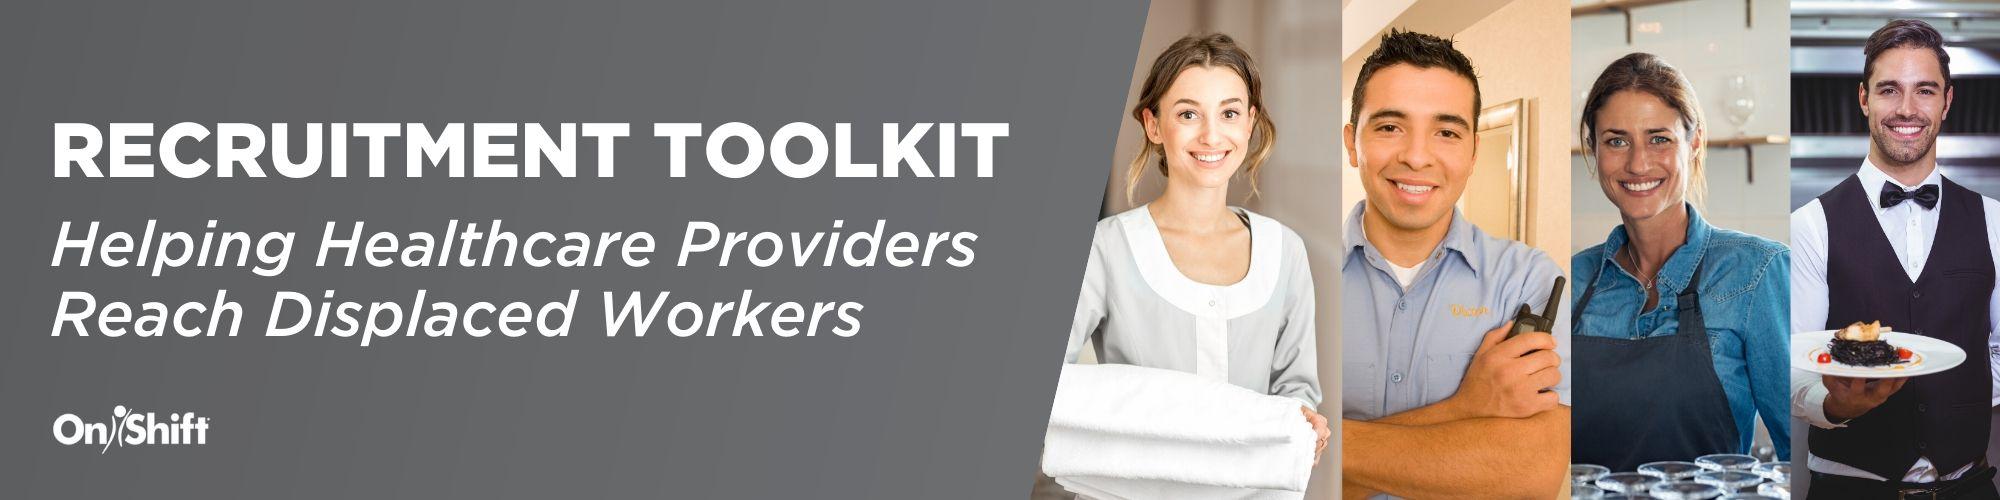 recruitment toolkit header - HEALTHCARE